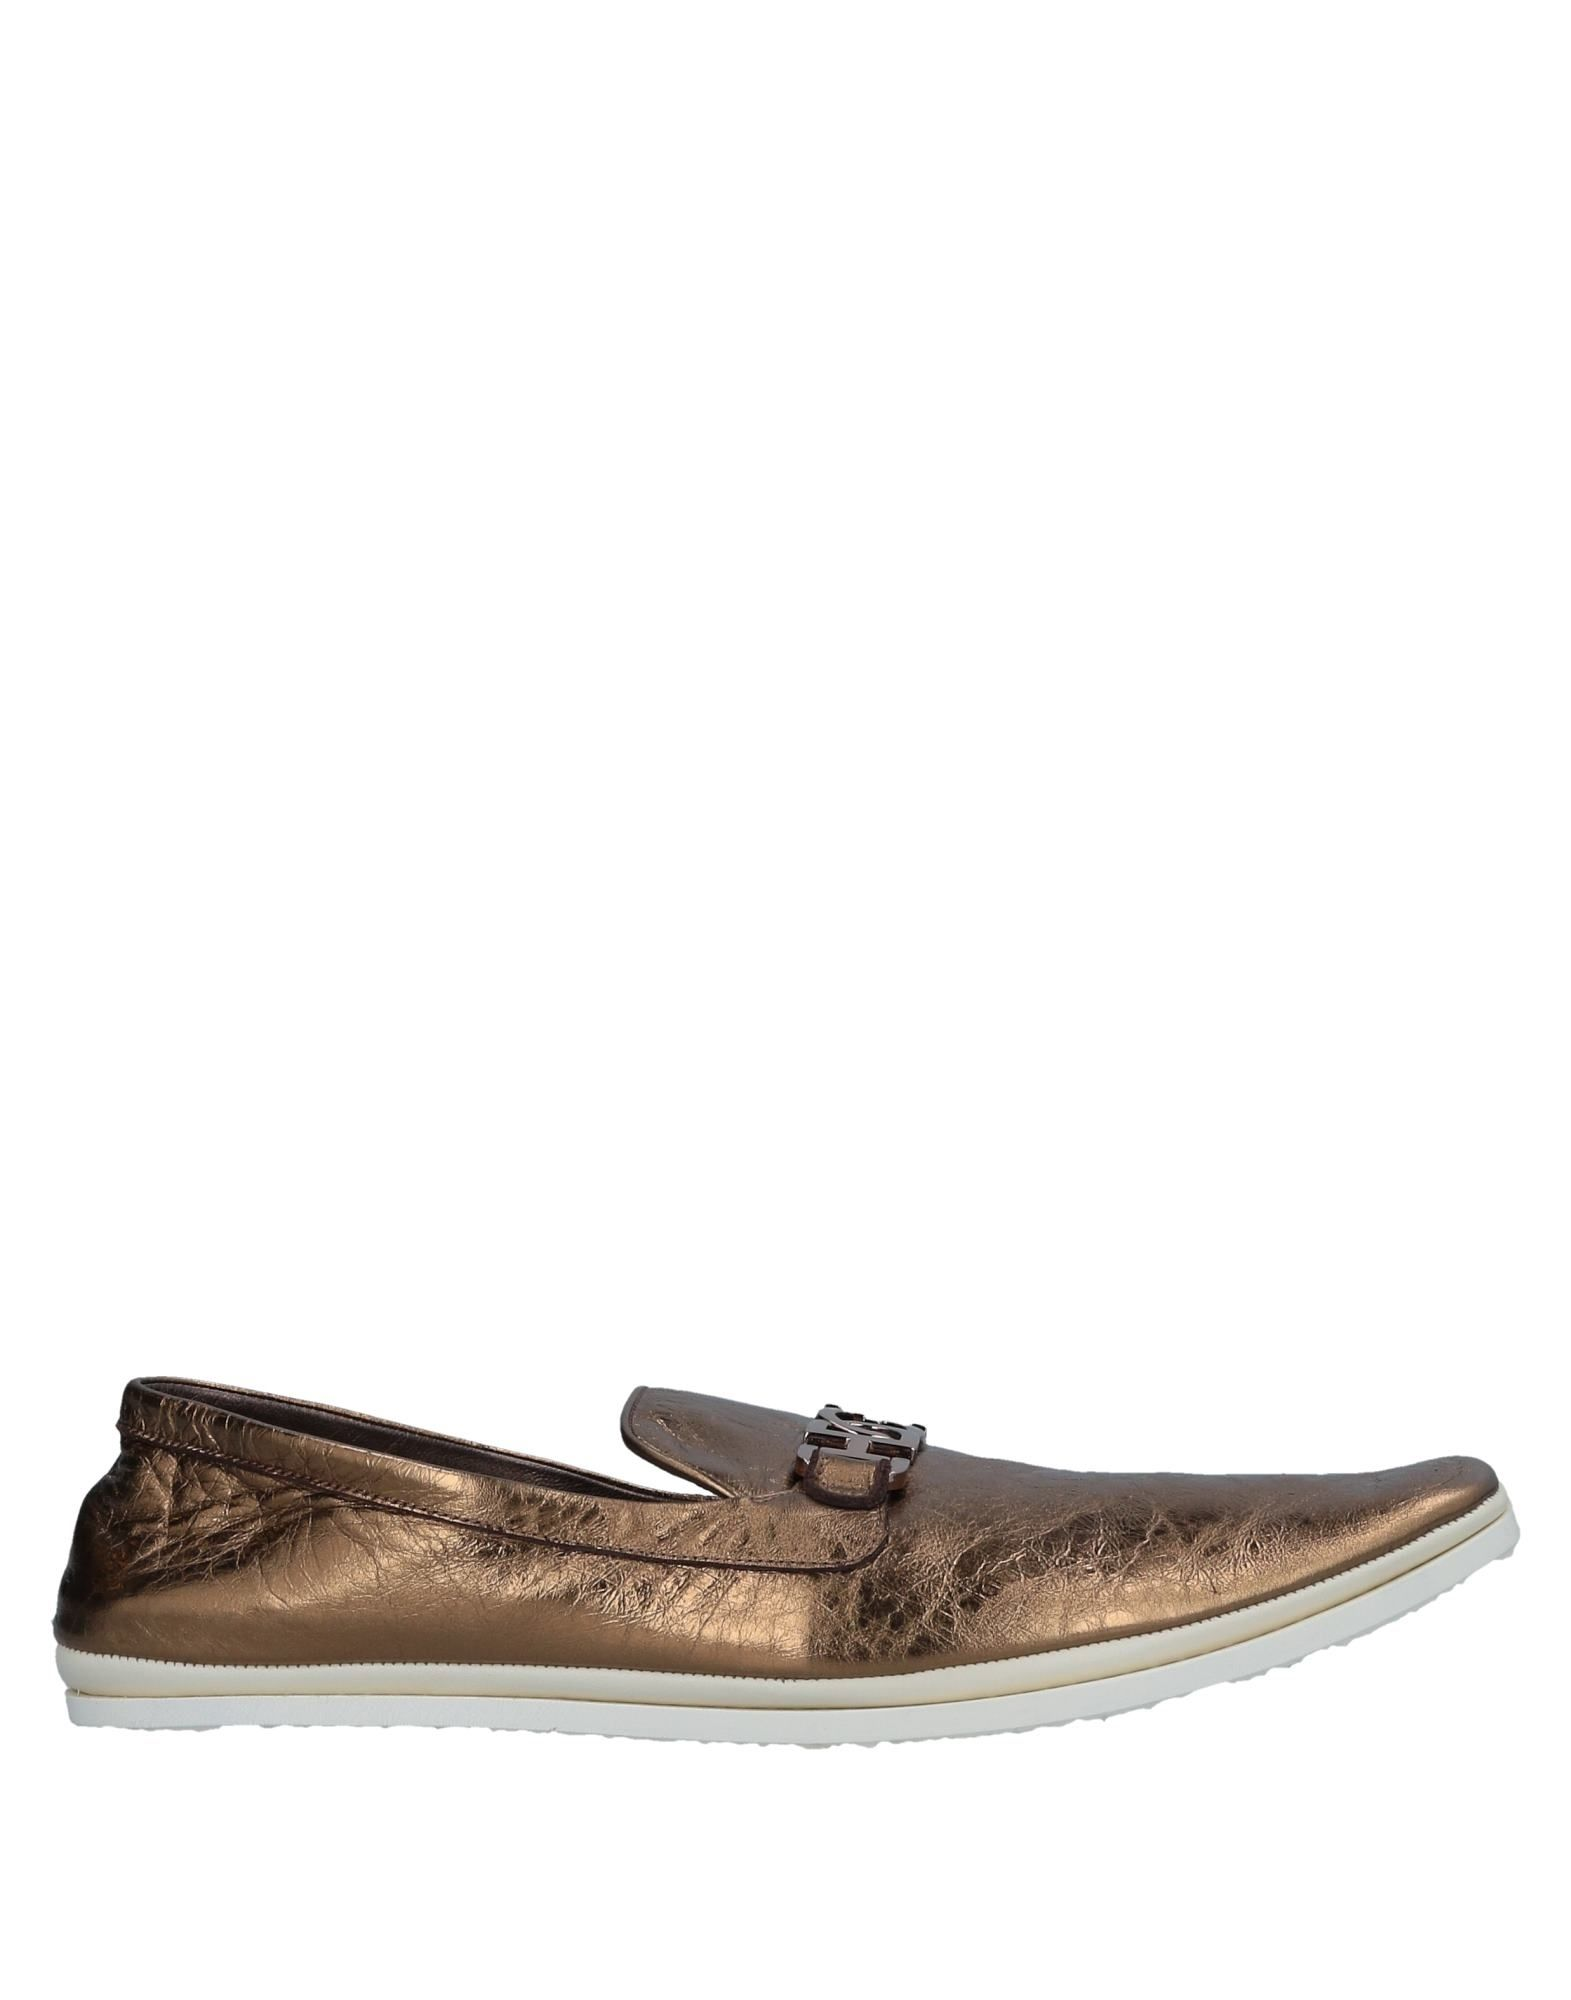 Dolce & Gabbana Mokassins Herren  11530153FM Gute Qualität beliebte Schuhe